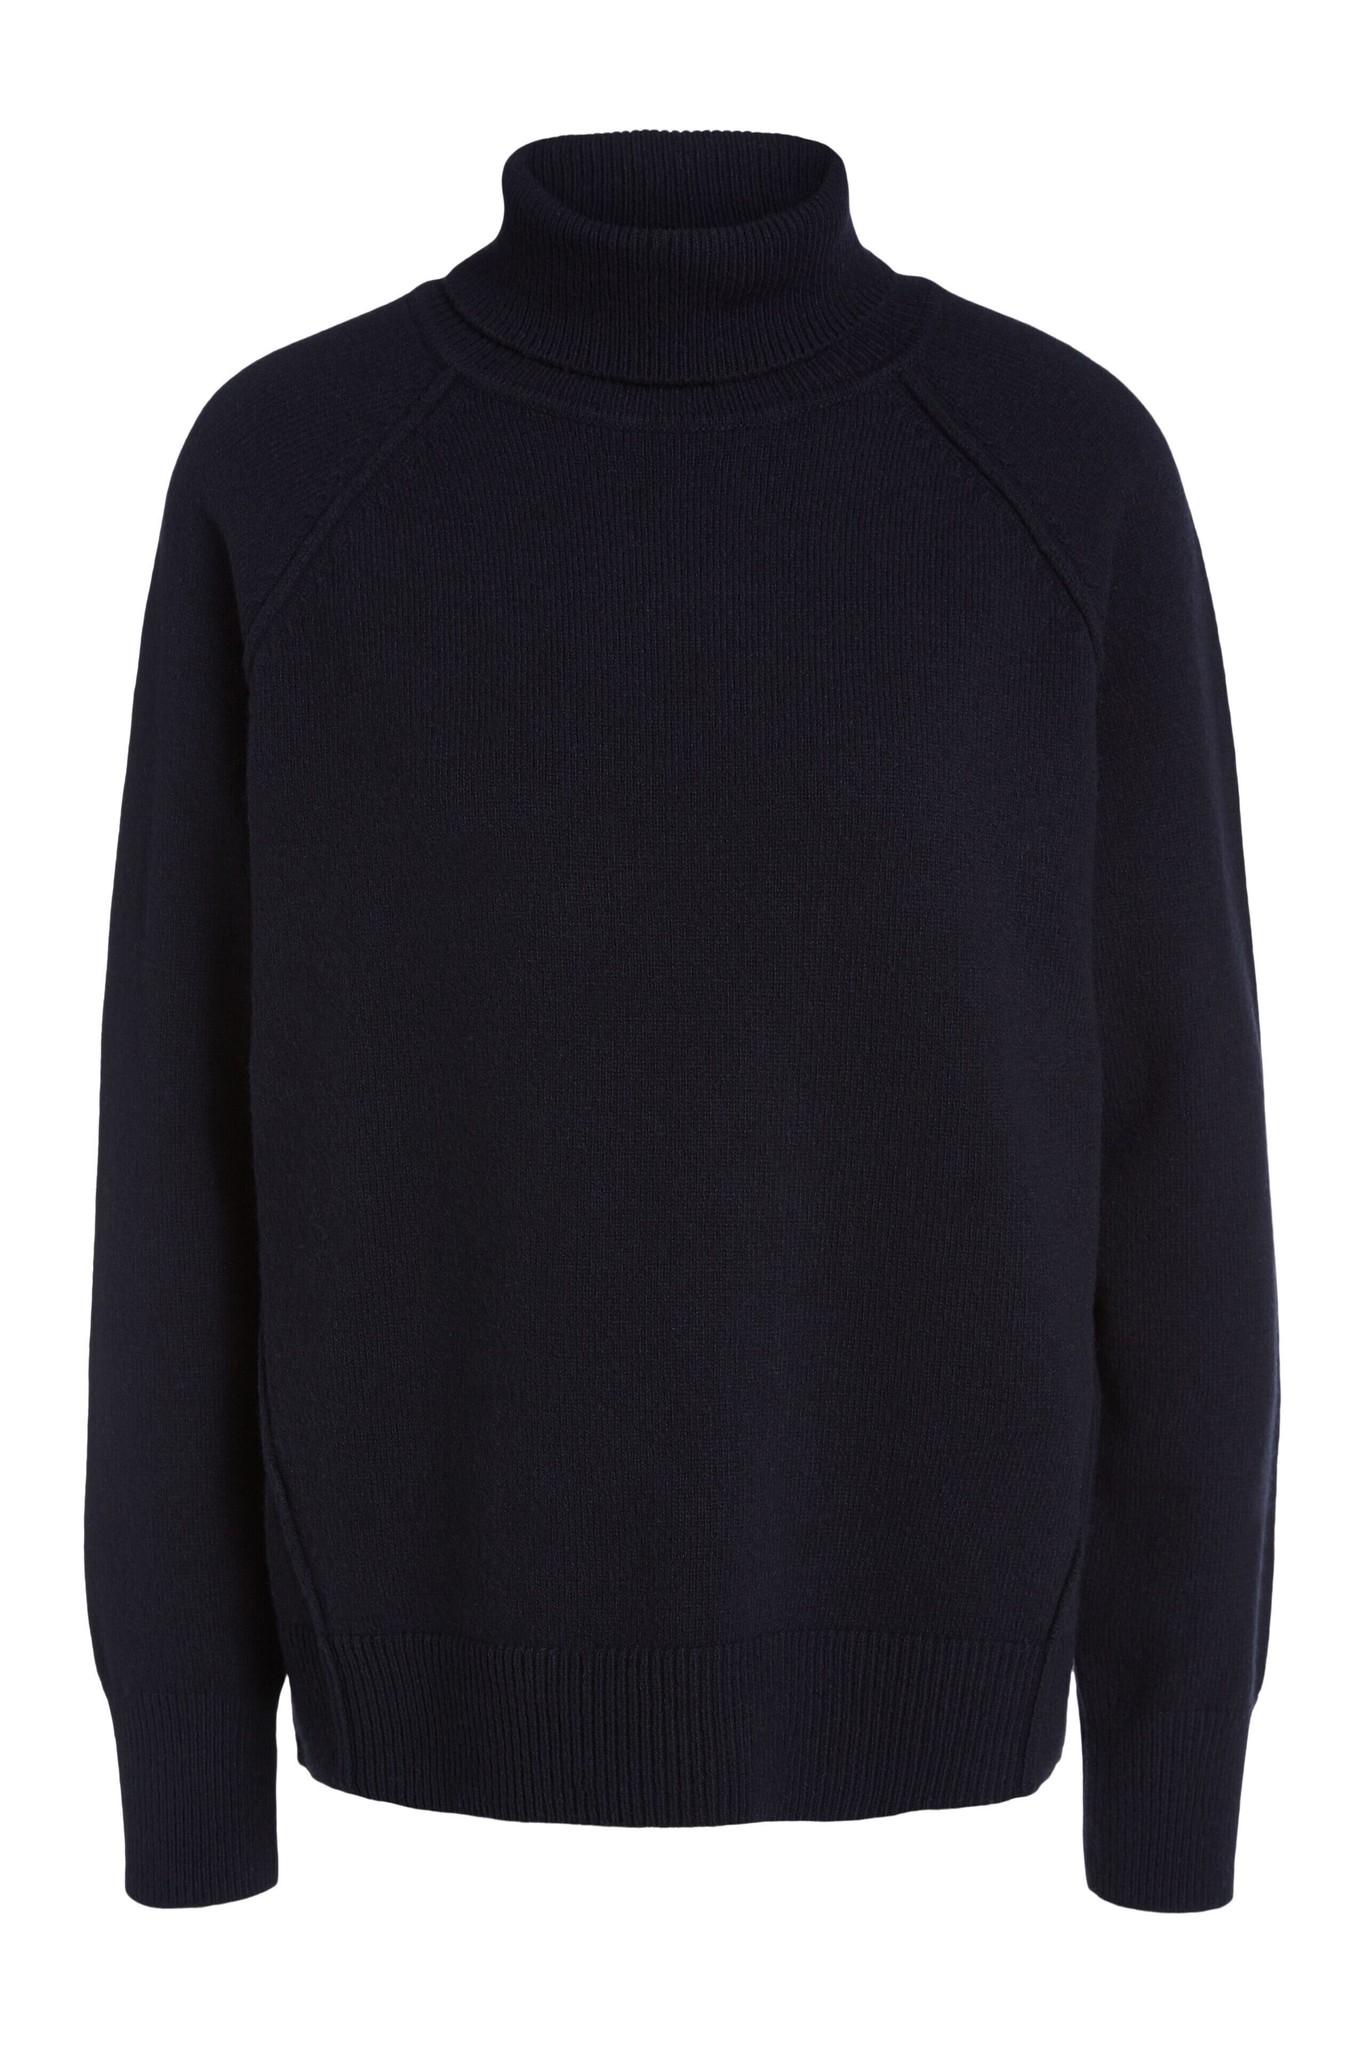 SET pullover 74281 9990-1